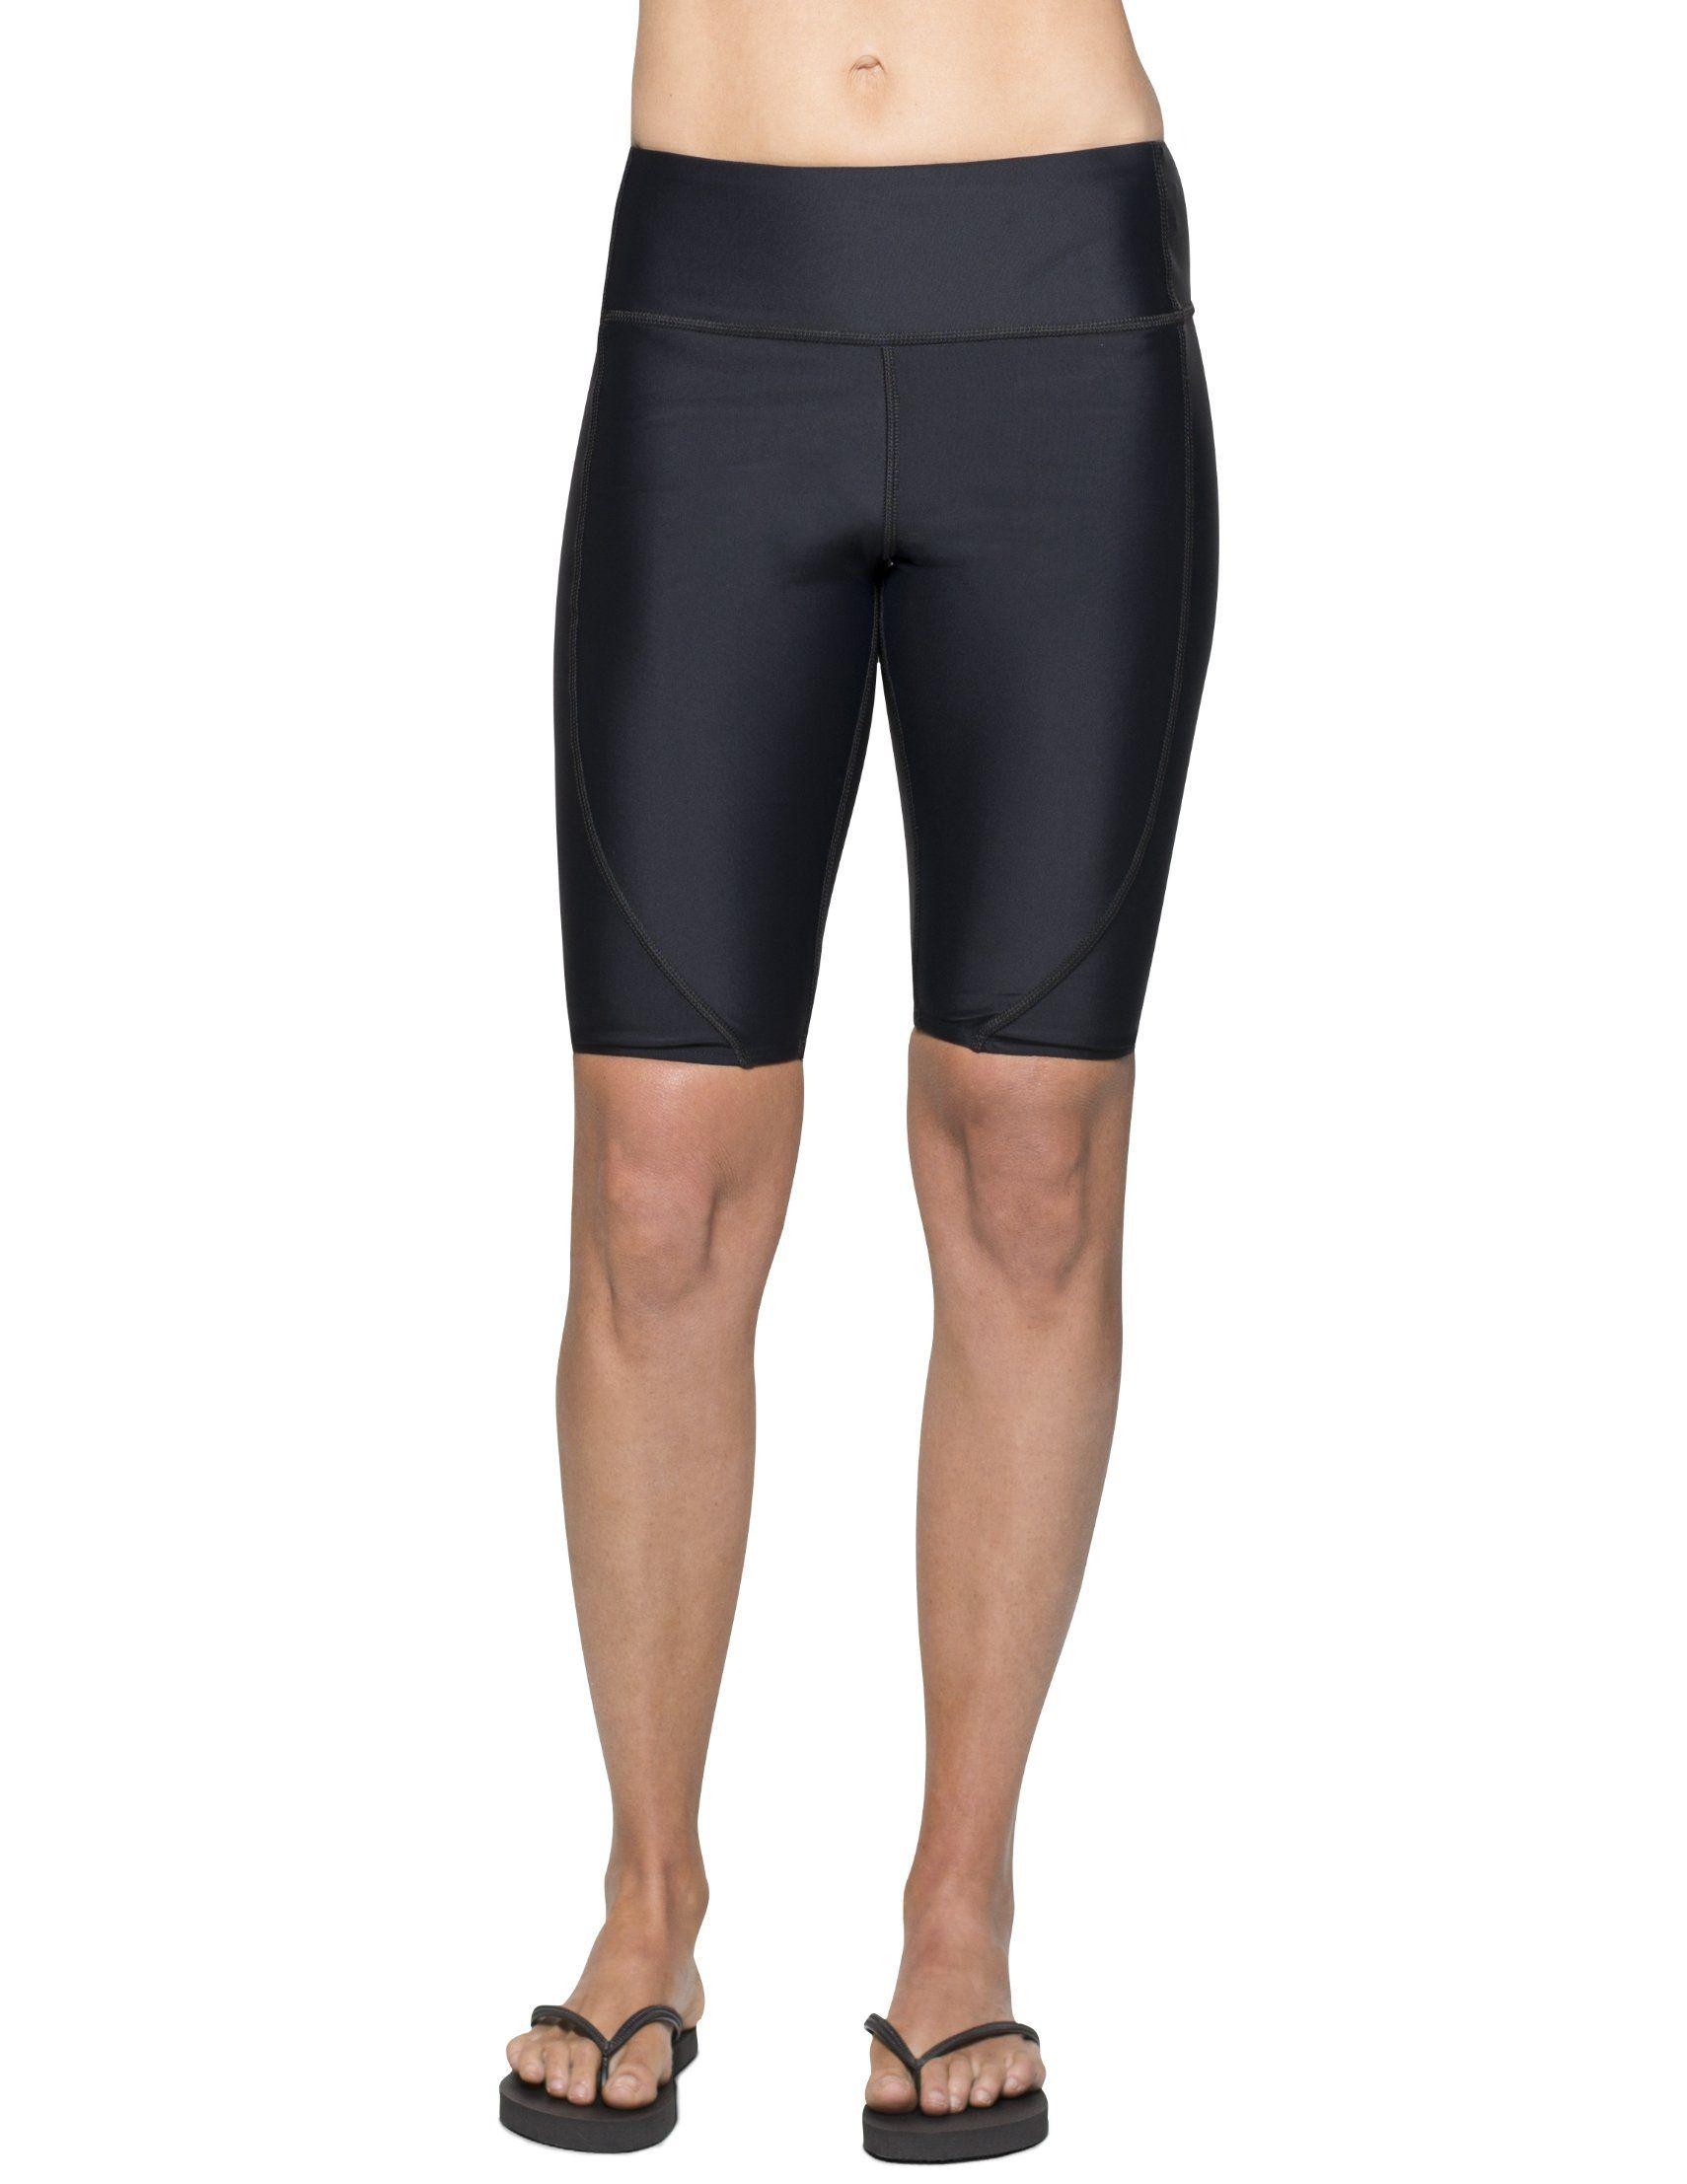 60352a2389 Tuga Women's Swim Short (UPF 50+), Black, 2X-Large. Lightweight ...